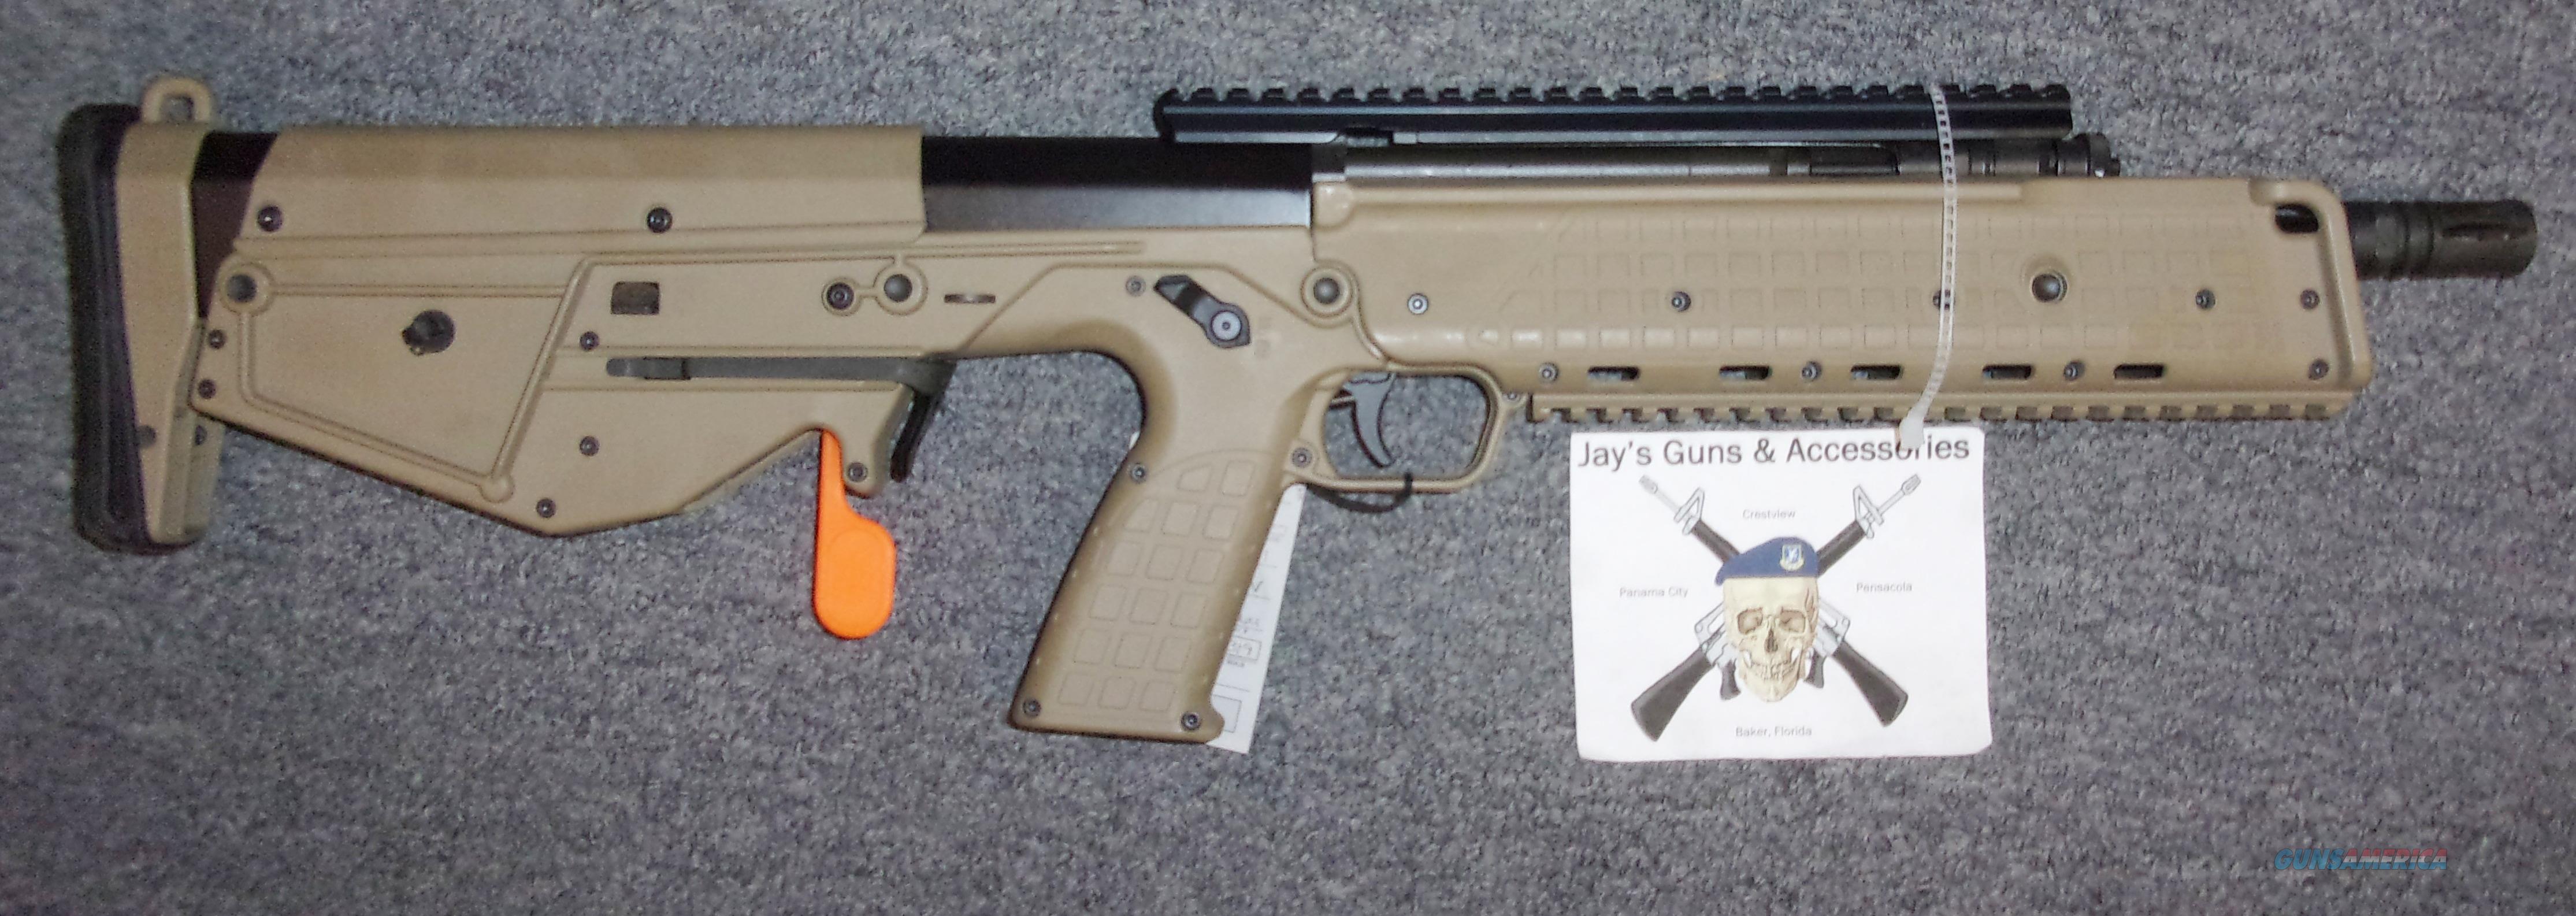 Kel-Tec RDB-17 w/Tan Finish  Guns > Rifles > Kel-Tec Rifles